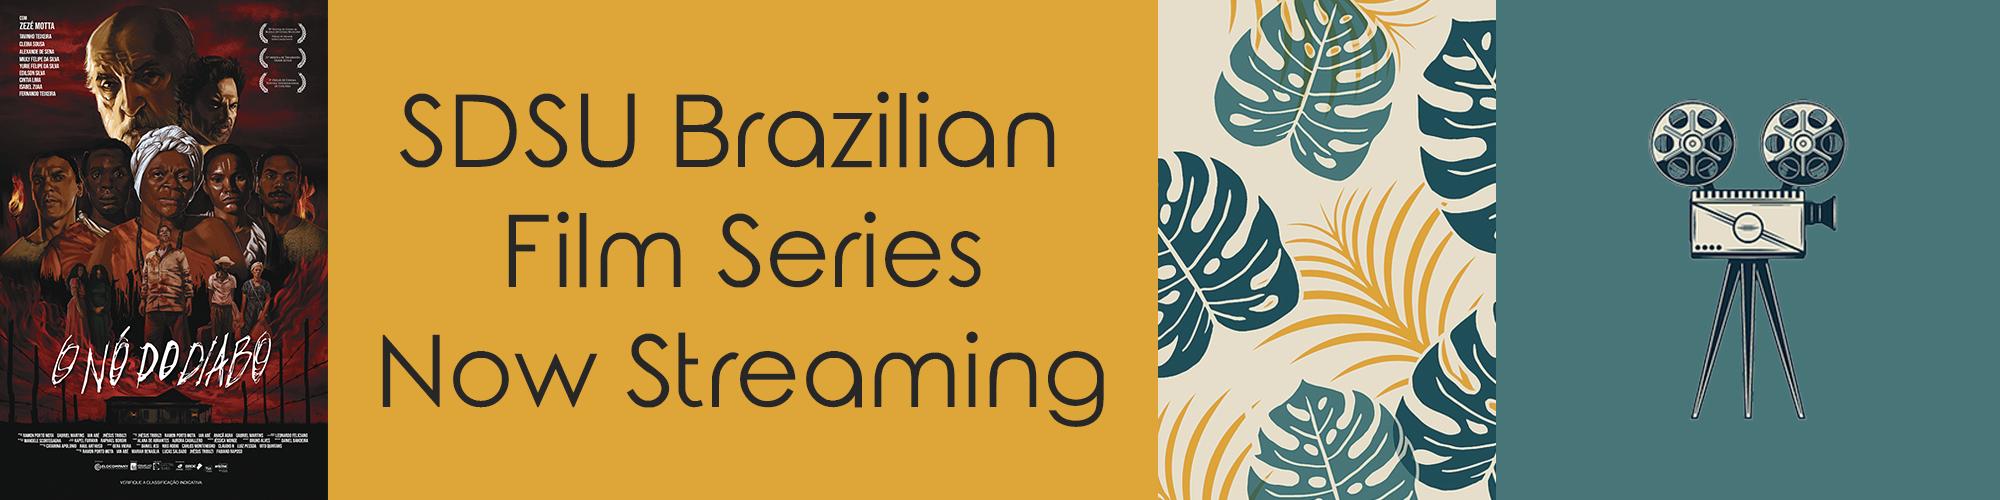 SDSU Brazilian Film Series Now Streaming